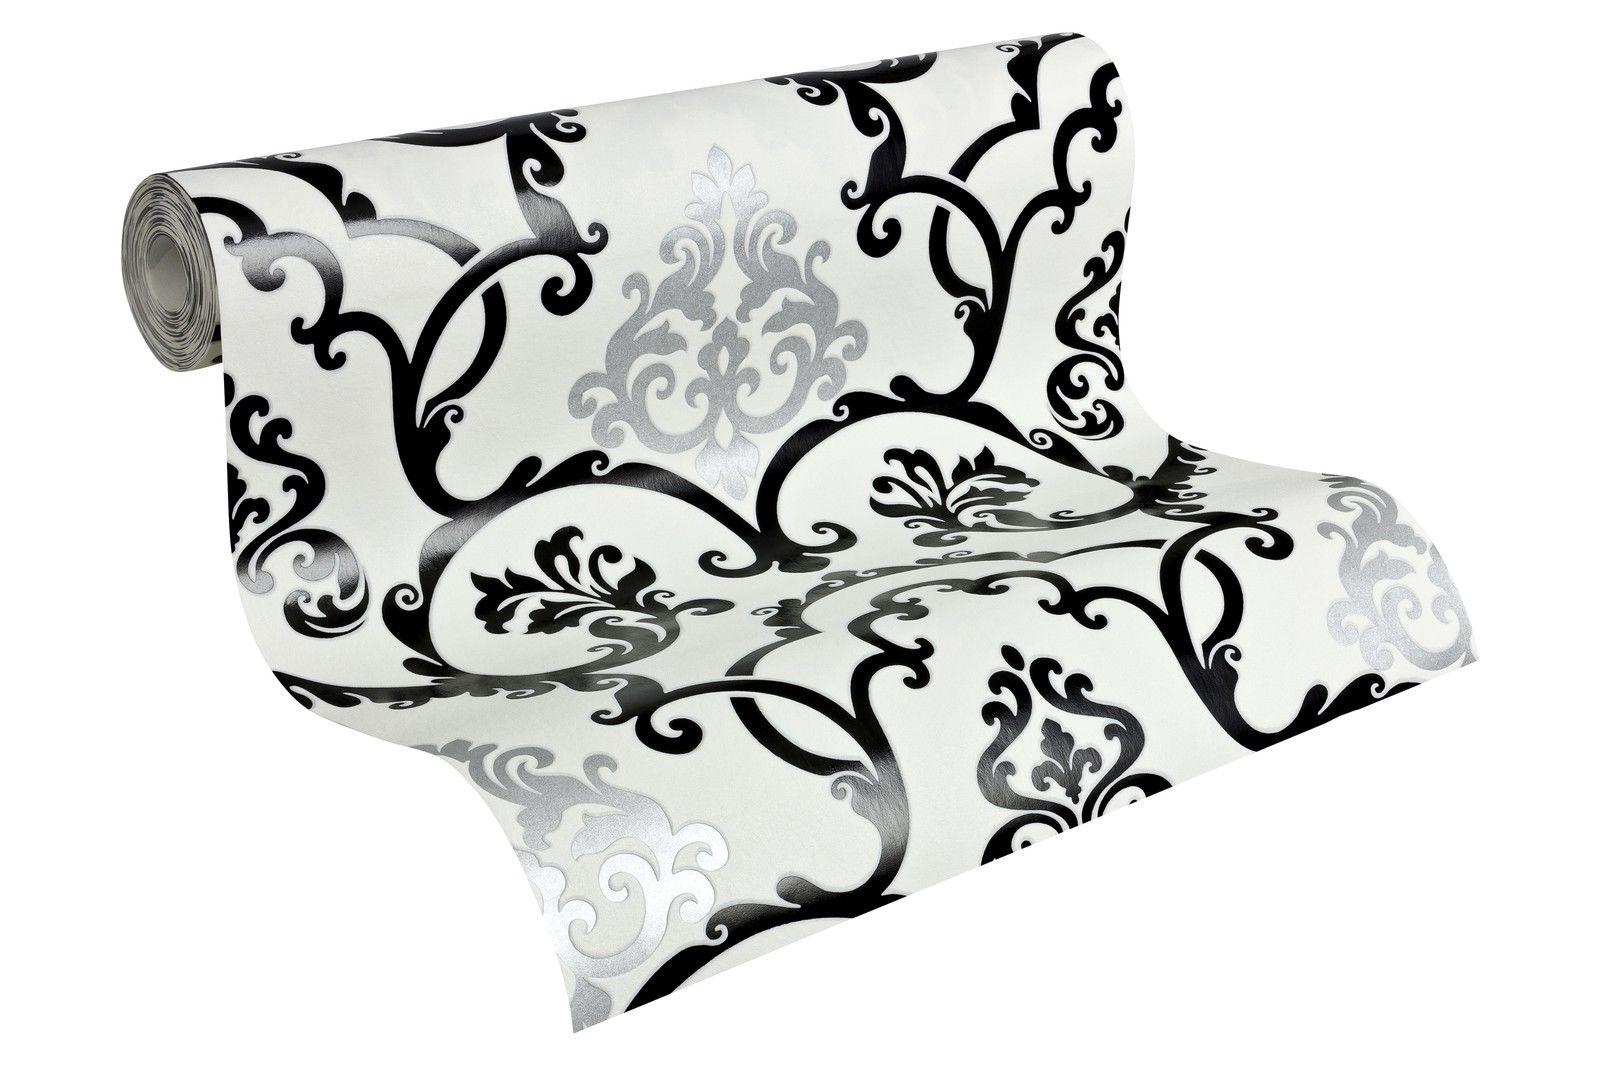 vlies tapete barock muster ornament schwarz wei silber glanz effekt klassisch 1 - Tapete Schwarz Weis Muster